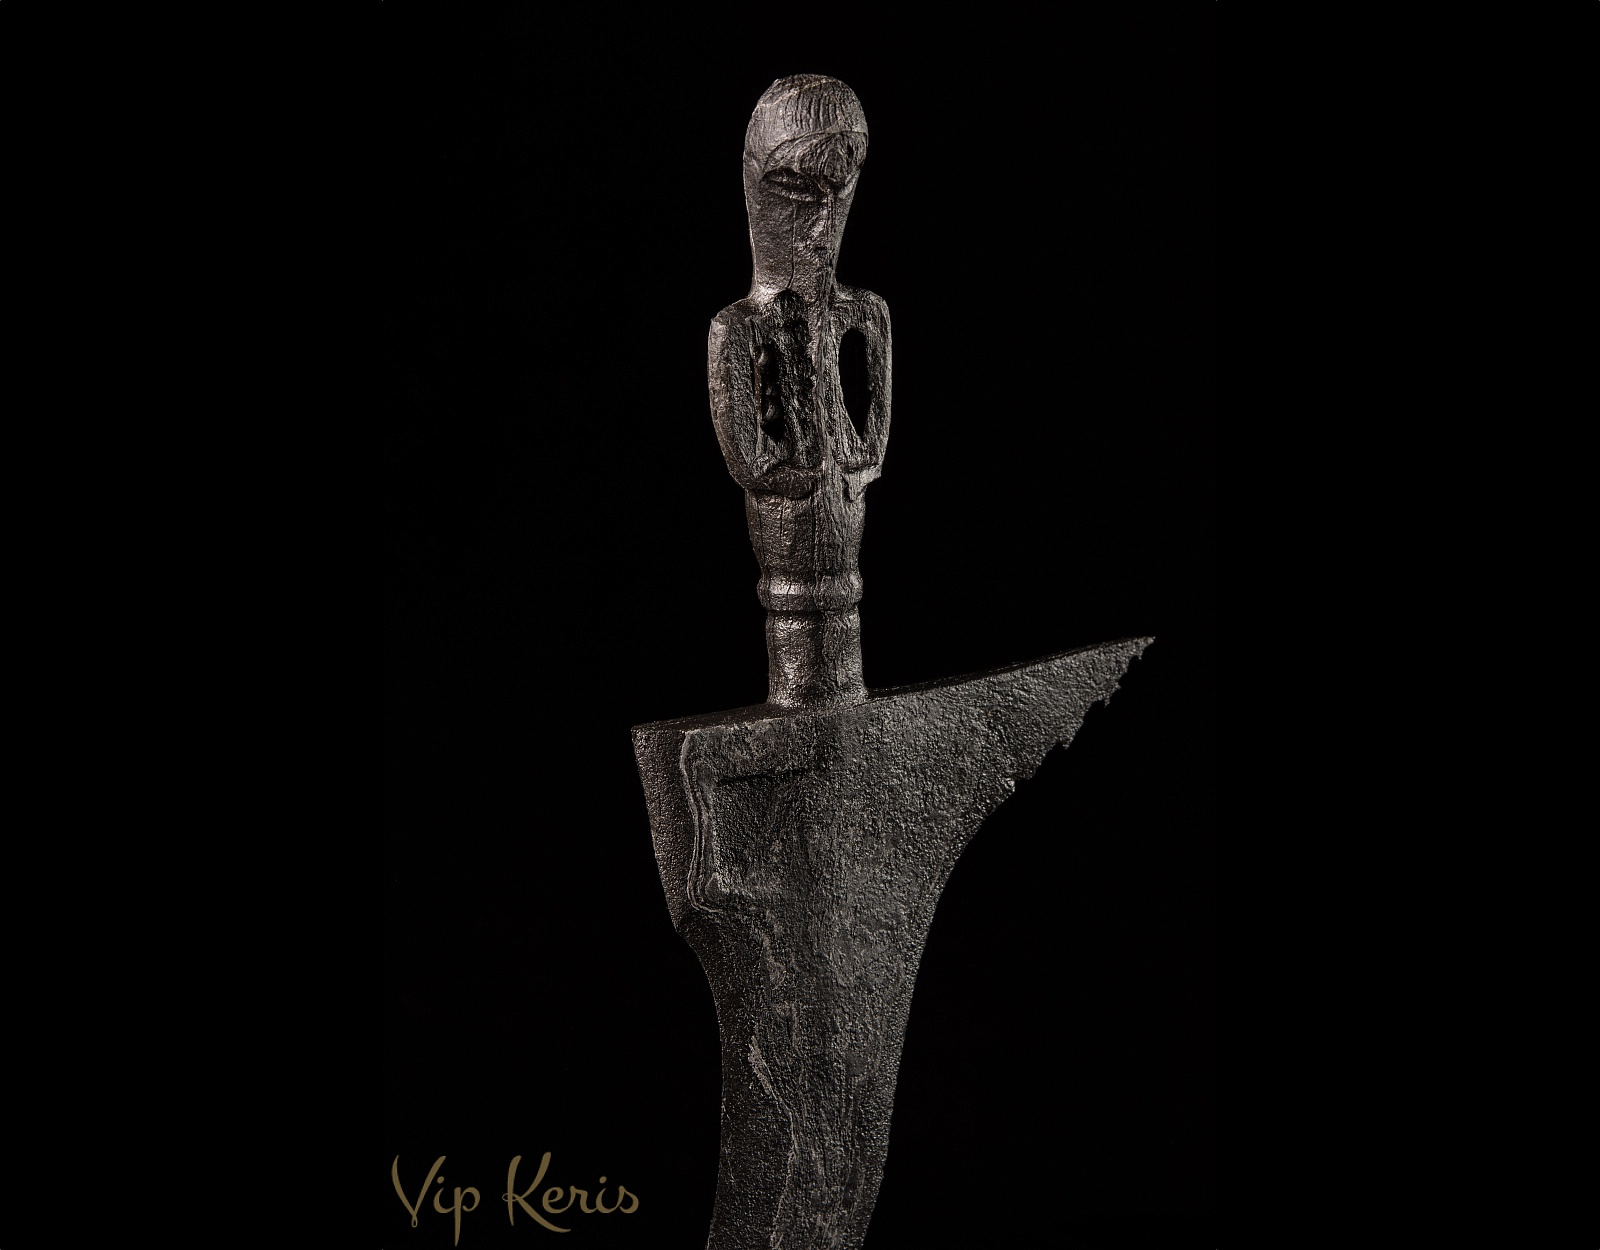 Ритуальный Крис Phutut Sajen Pertapa фото VipKeris